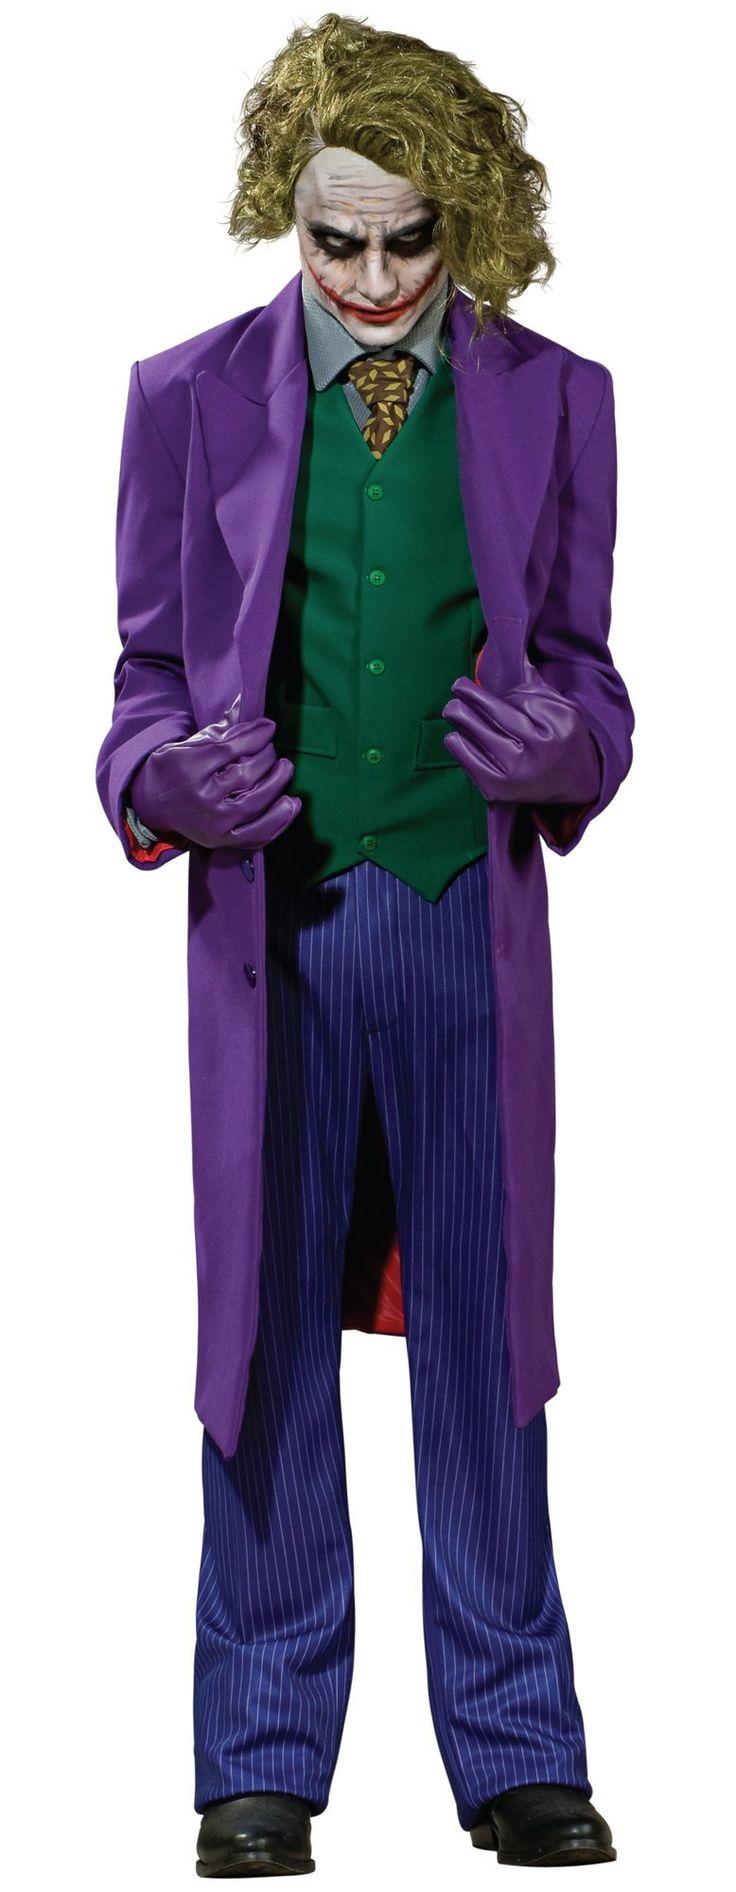 Batman Dark Knight The Joker Grand Heritage Collection @ buycostumes.com